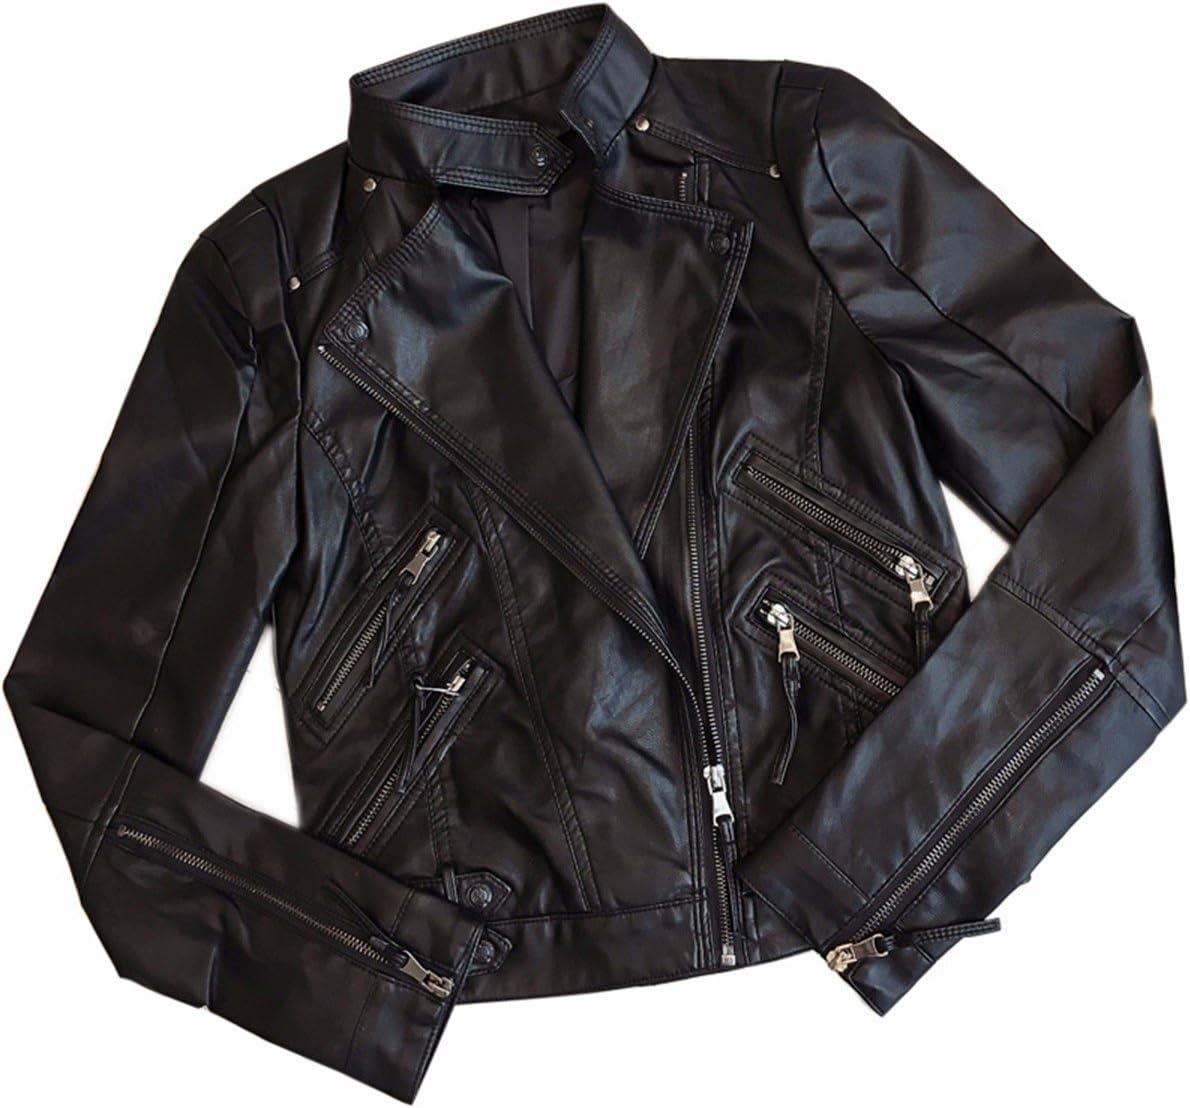 OLQMY Women's short, PU leather, motorcycle coat, slim slim lady jacket,XL